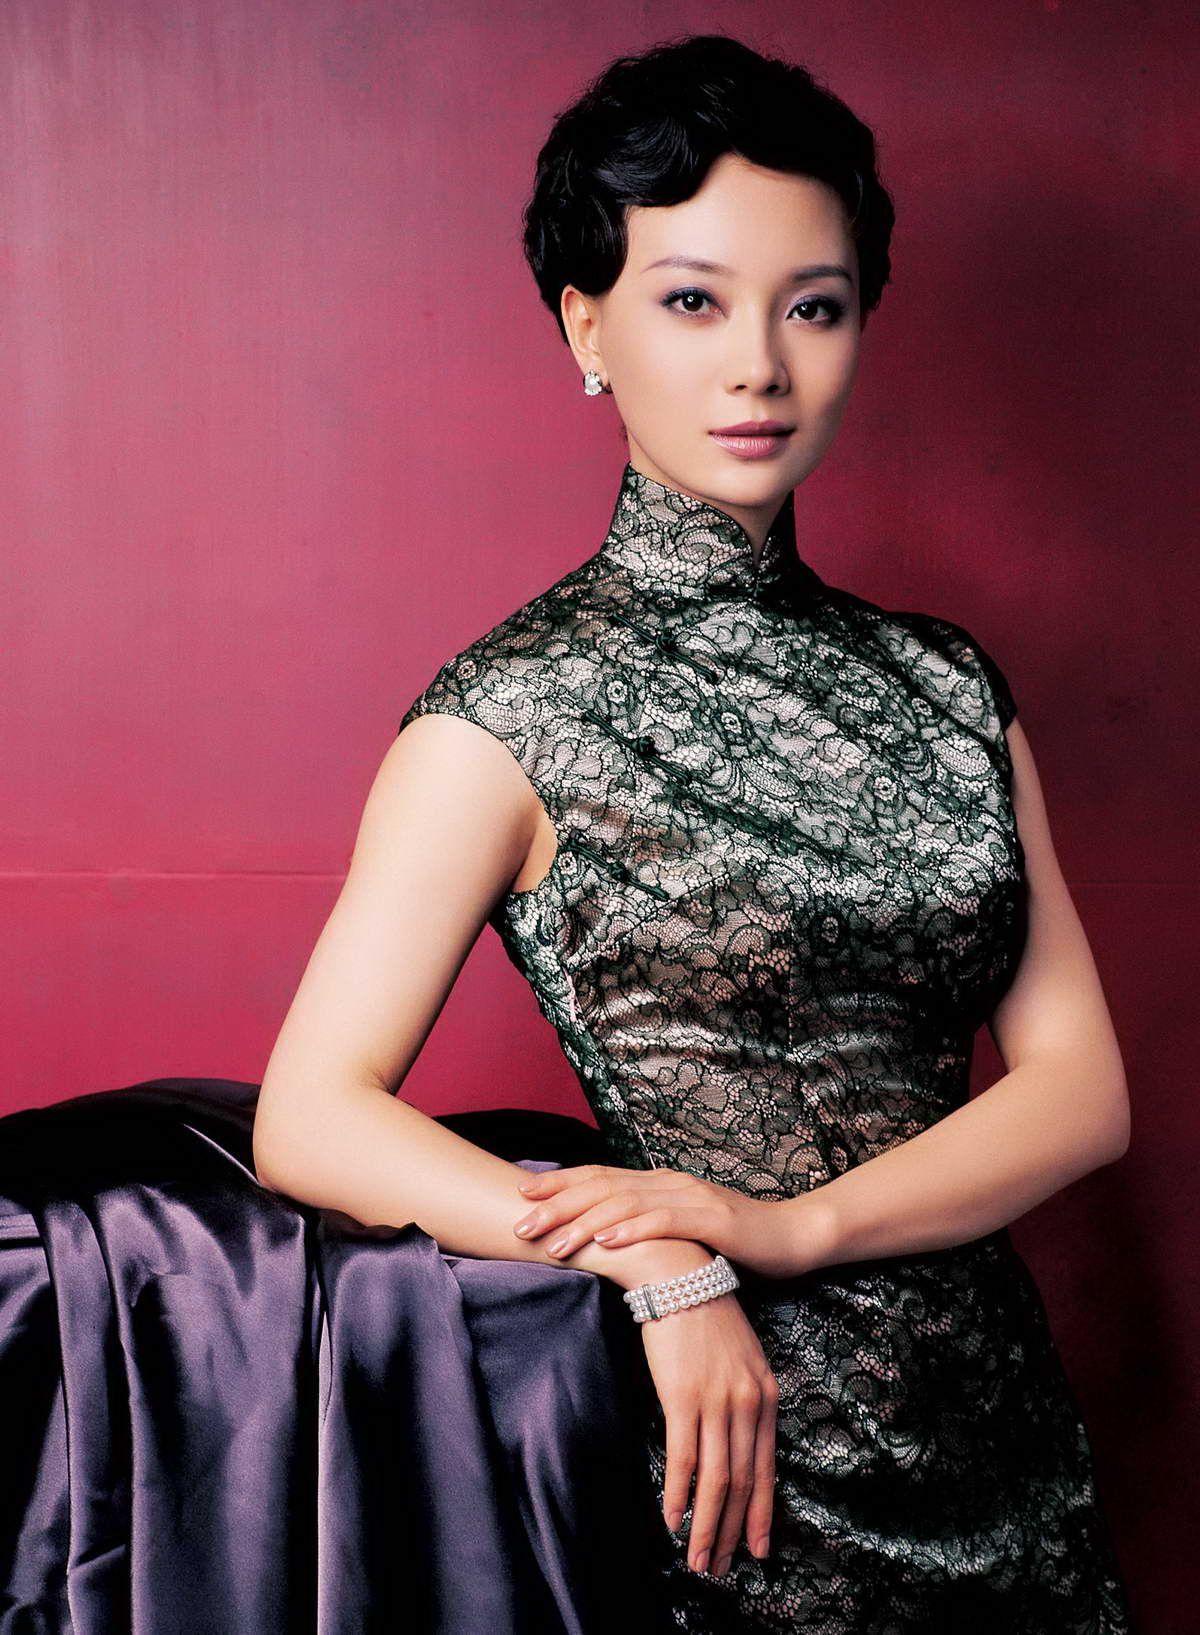 hot actress cute: Chinese Beautiful Actress Wardrobe Malfunctions, Top 20  Most Beautiful Chinese Babes